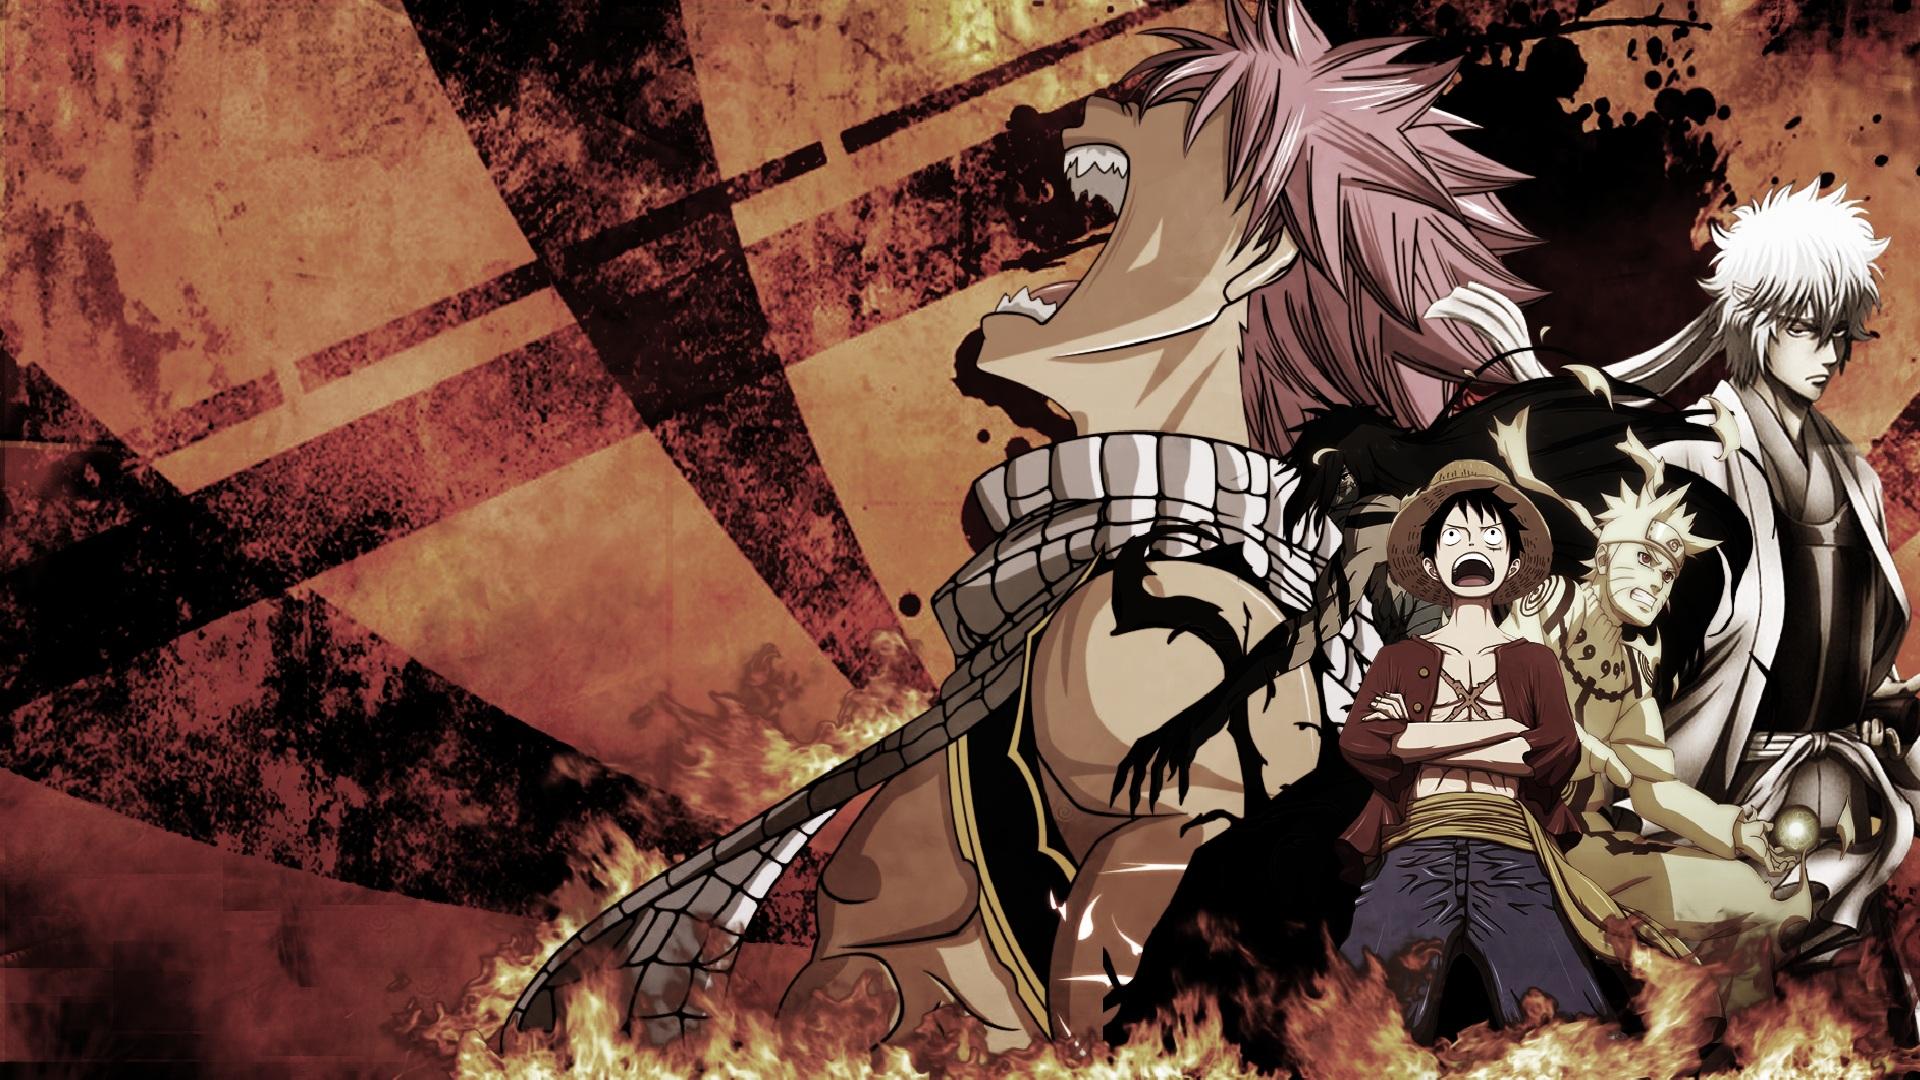 NARUTO HD Wallpaper Zerochan Anime Image Board